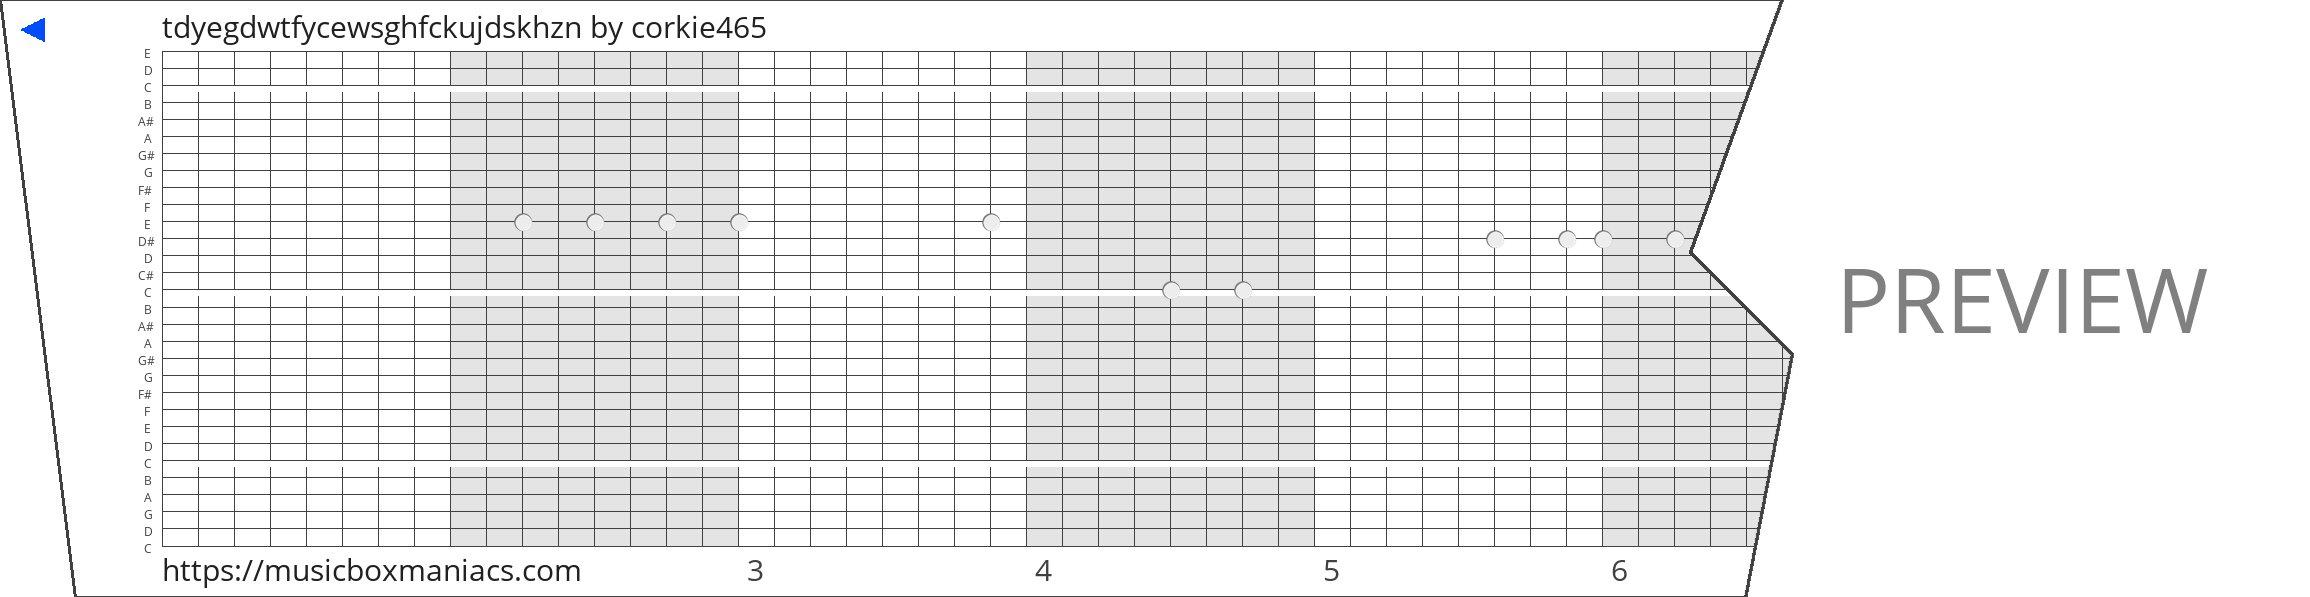 tdyegdwtfycewsghfckujdskhzn 30 note music box paper strip